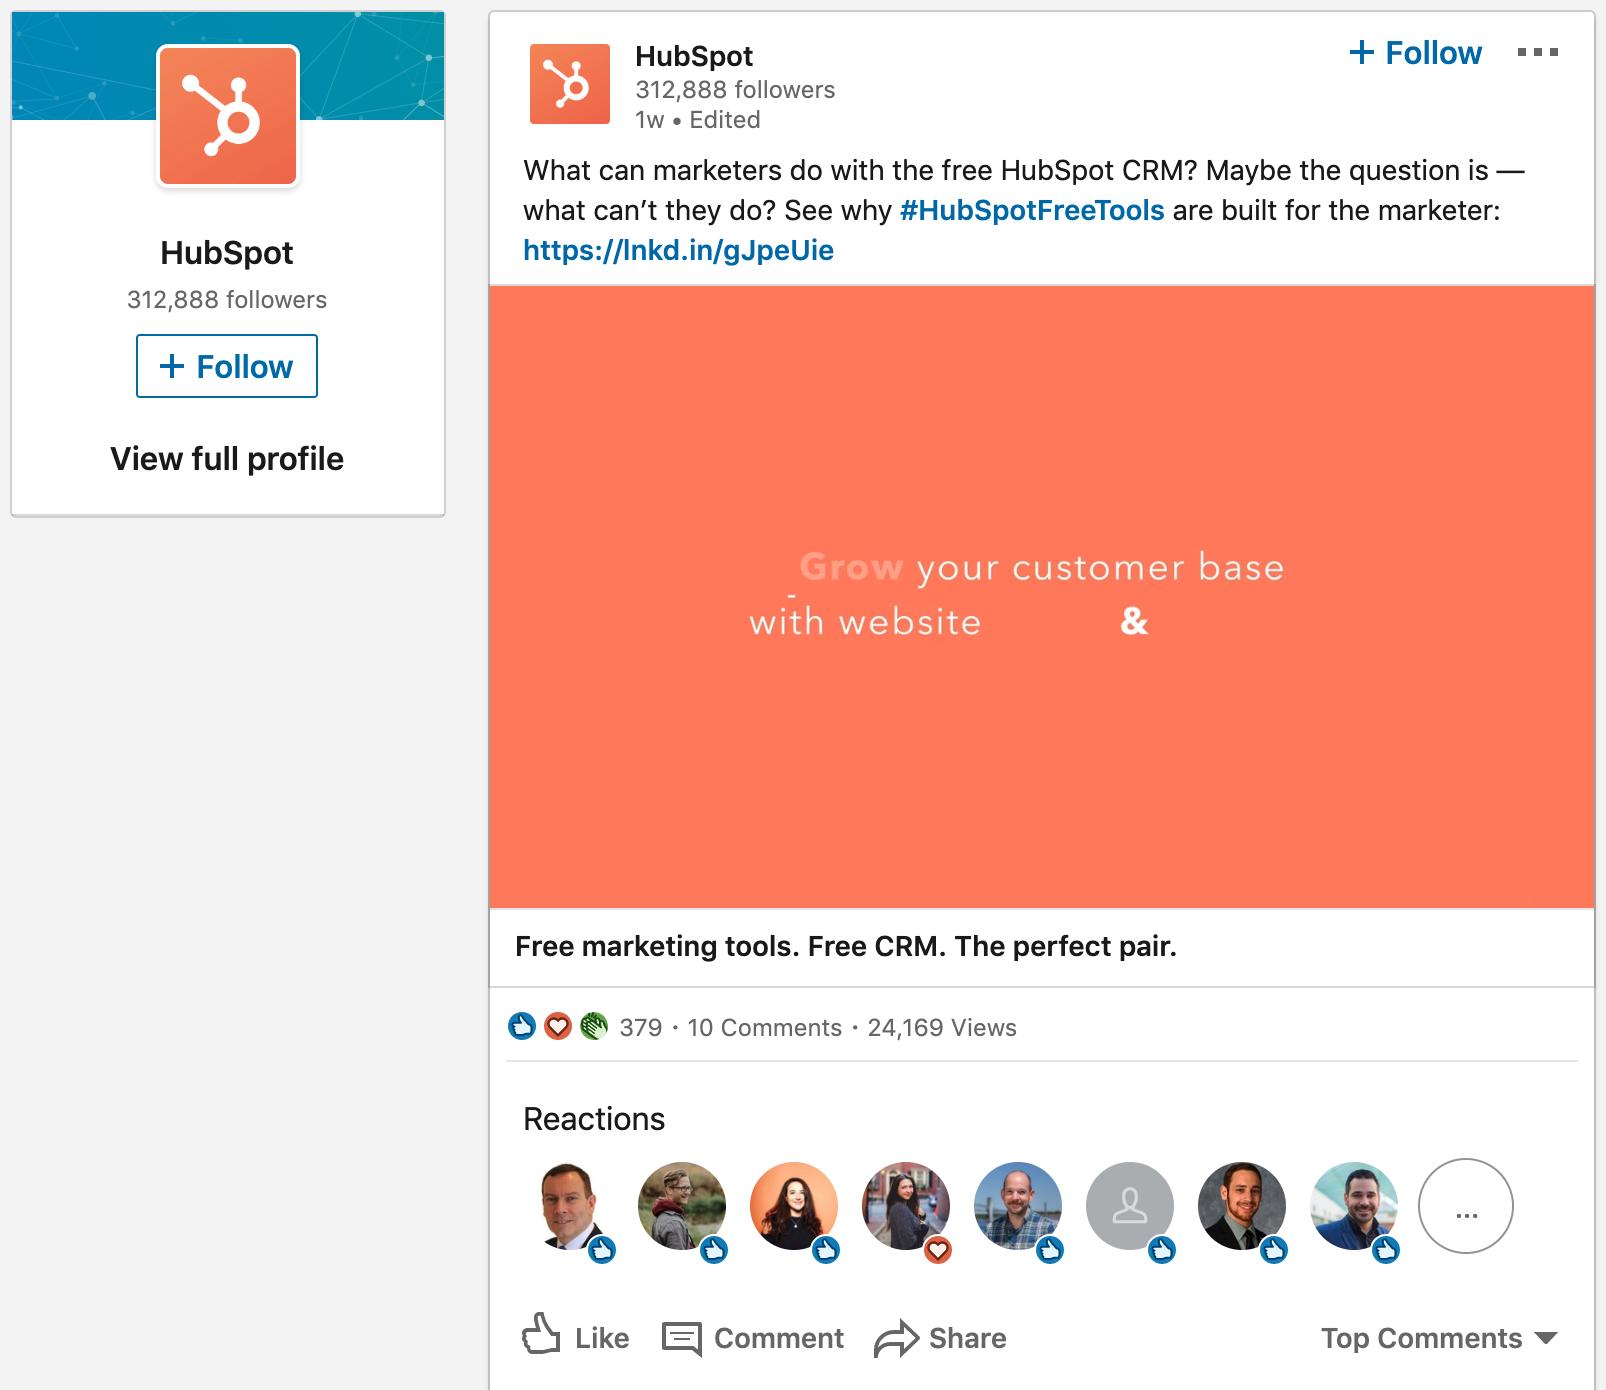 HubSpot LinkedIn Ad details